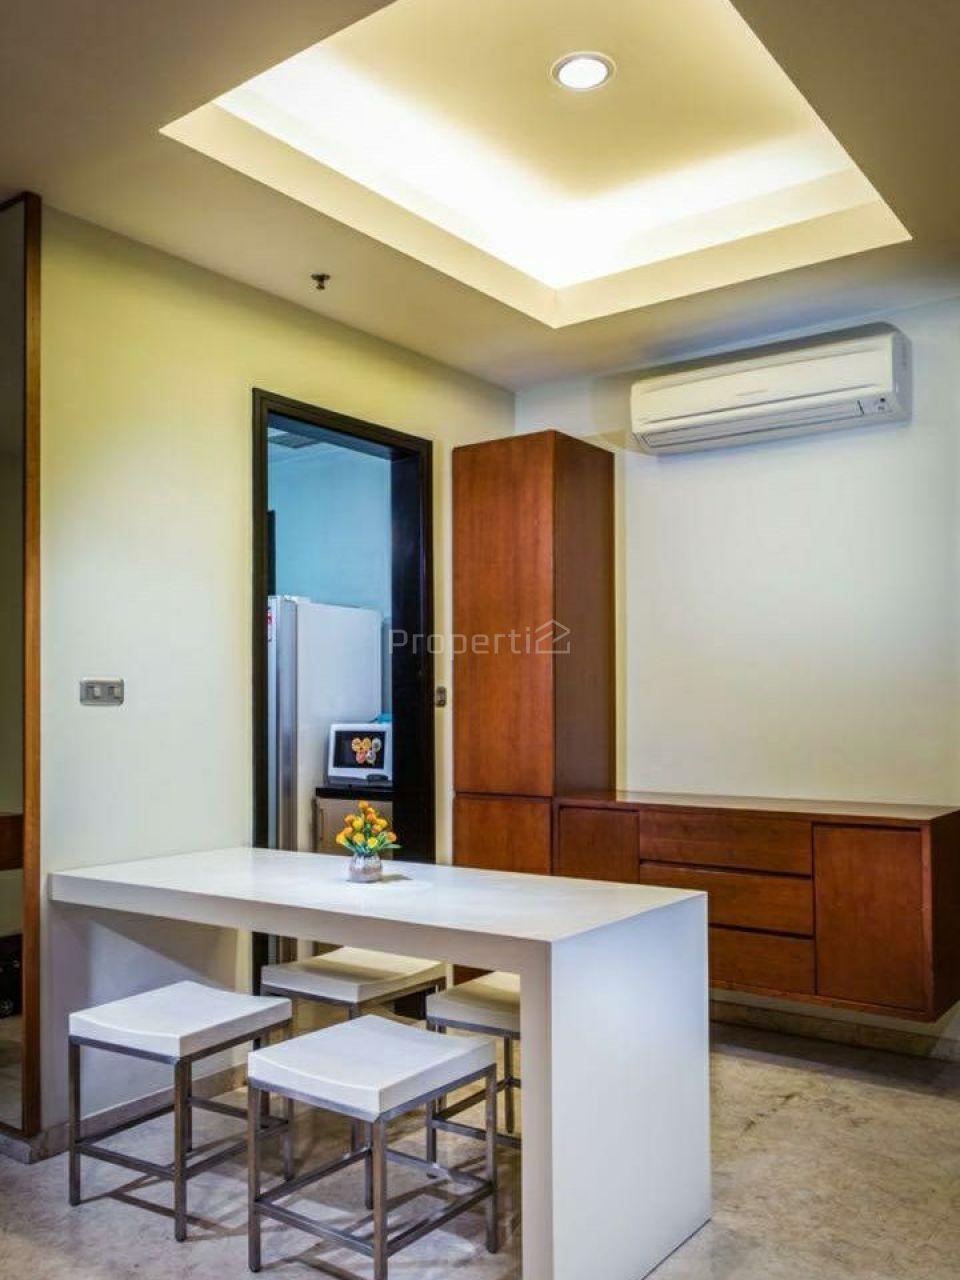 Unit Apartemen Pusat Kota di Setiabudi Residences, Lantai 10, DKI Jakarta